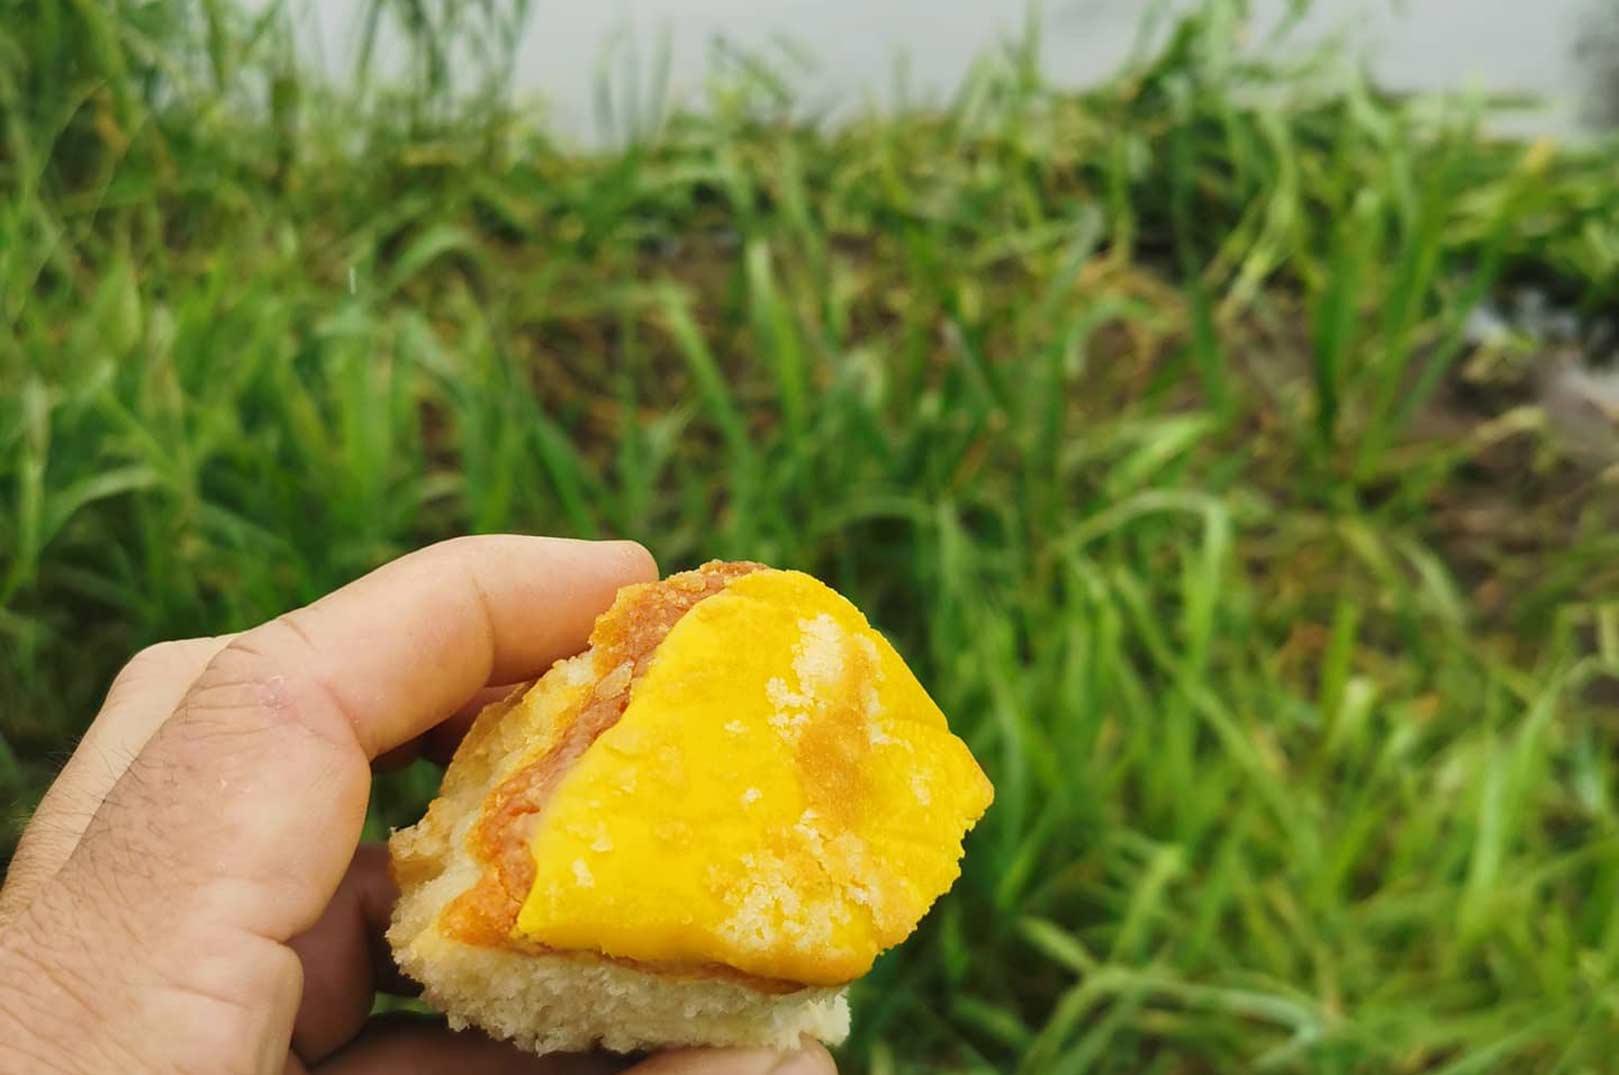 Gå aldrig ned på citronmåne - det kan koste fisk!